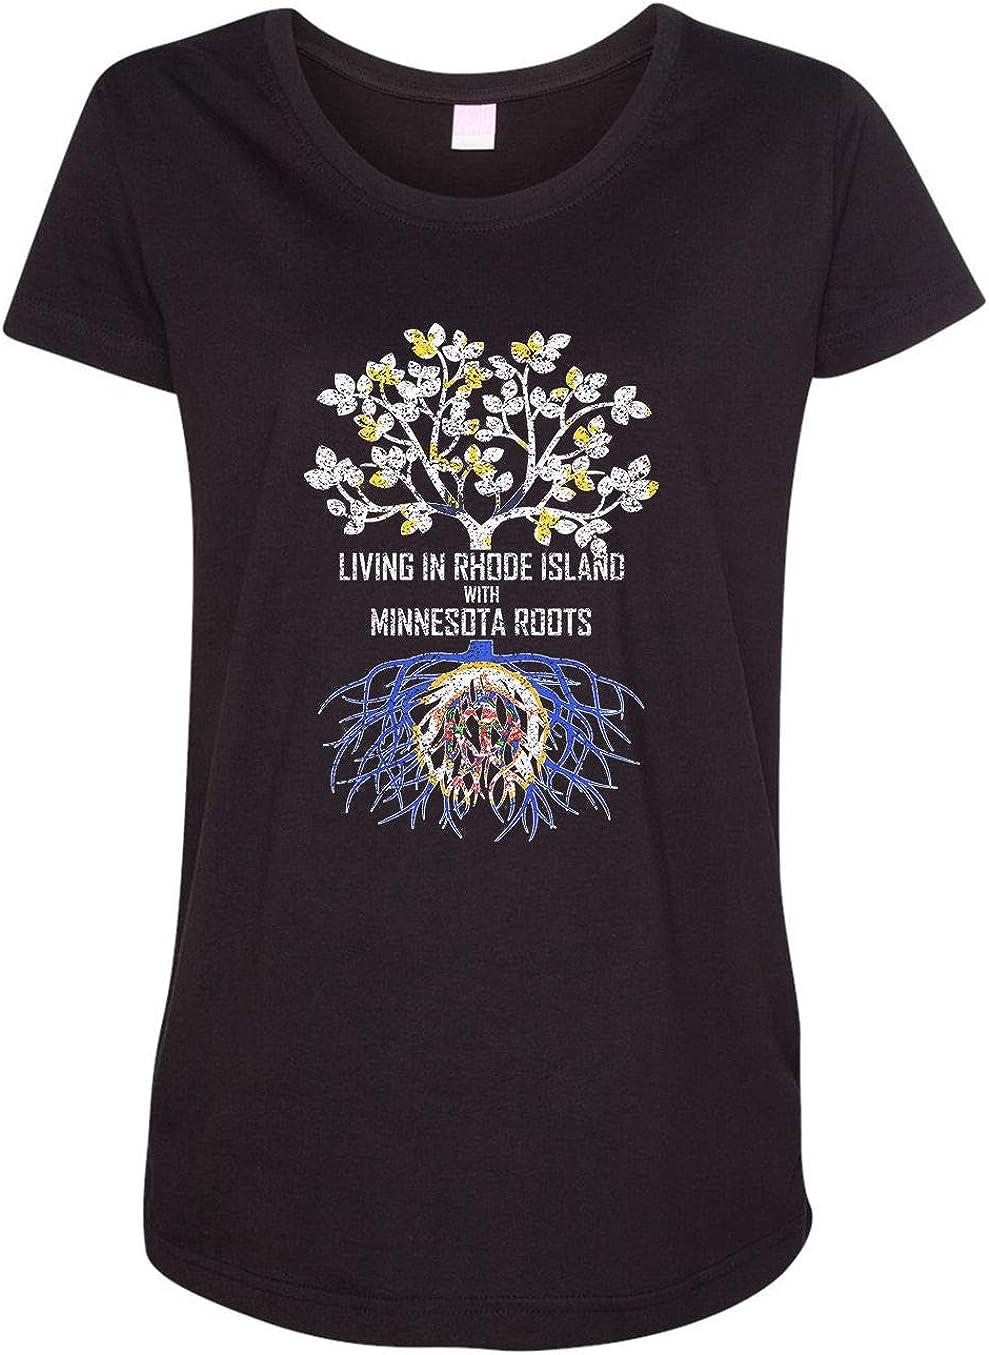 HARD EDGE DESIGN Women's Living in Rhode Island with Minnesota Roots T-Shirt